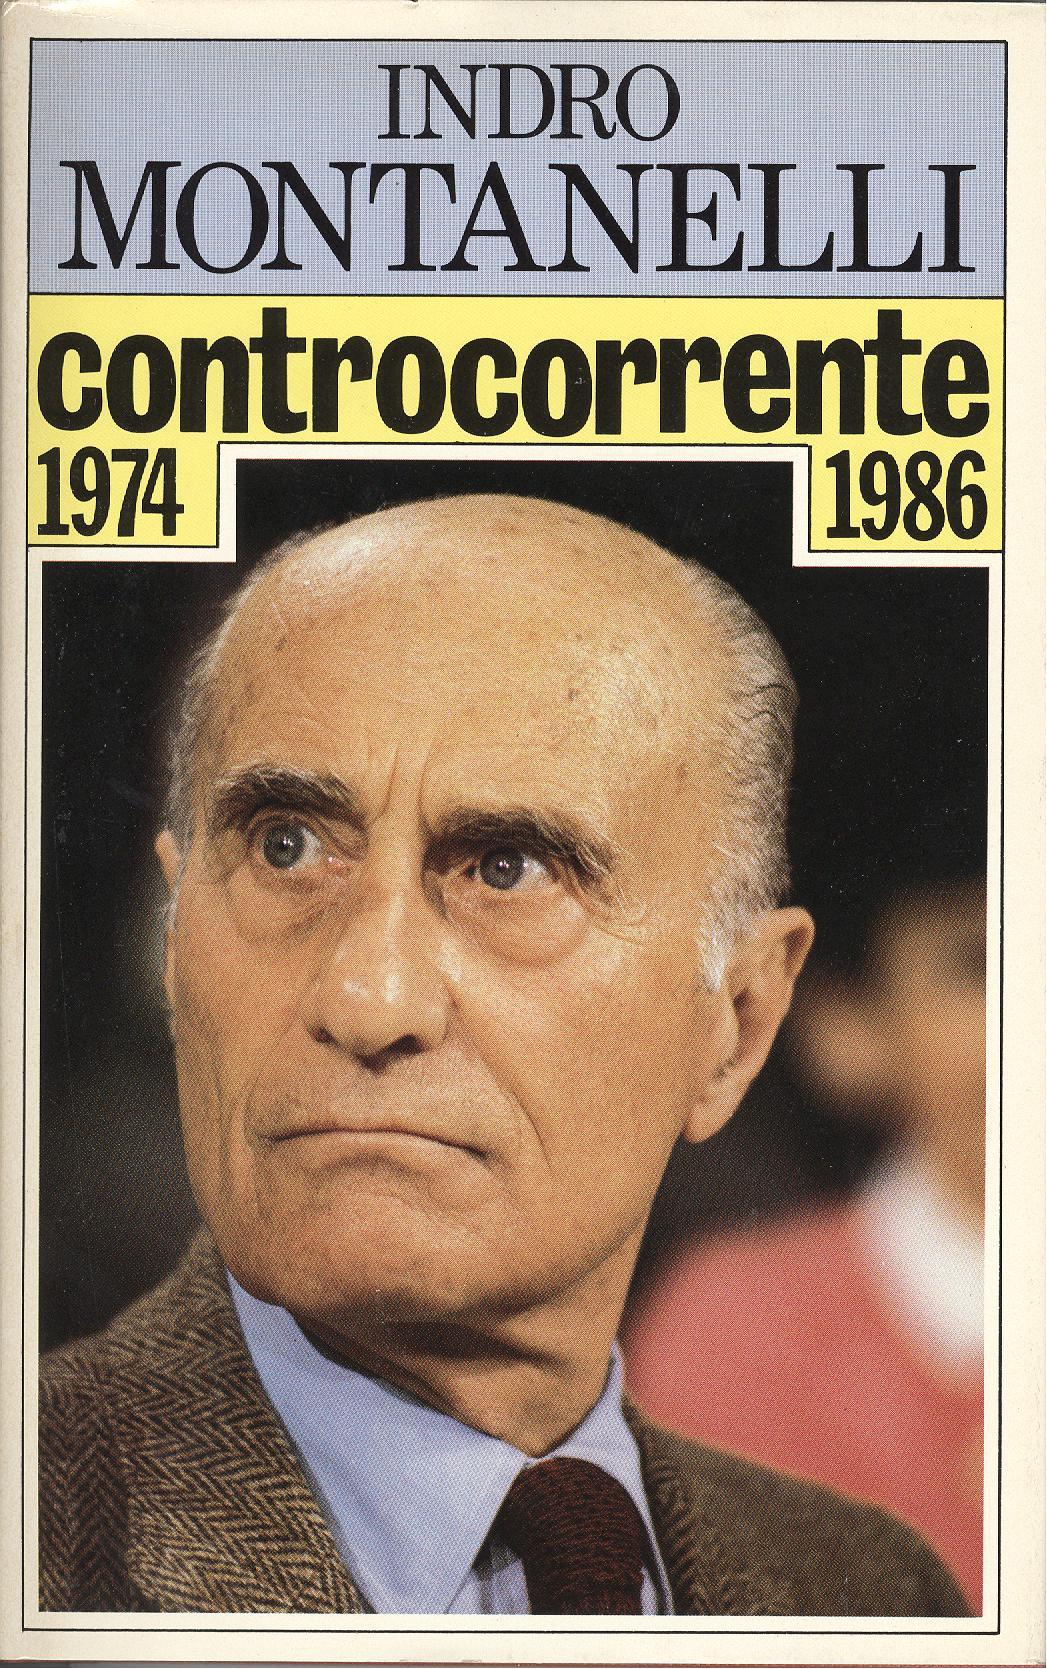 Controcorrente 1974-1986